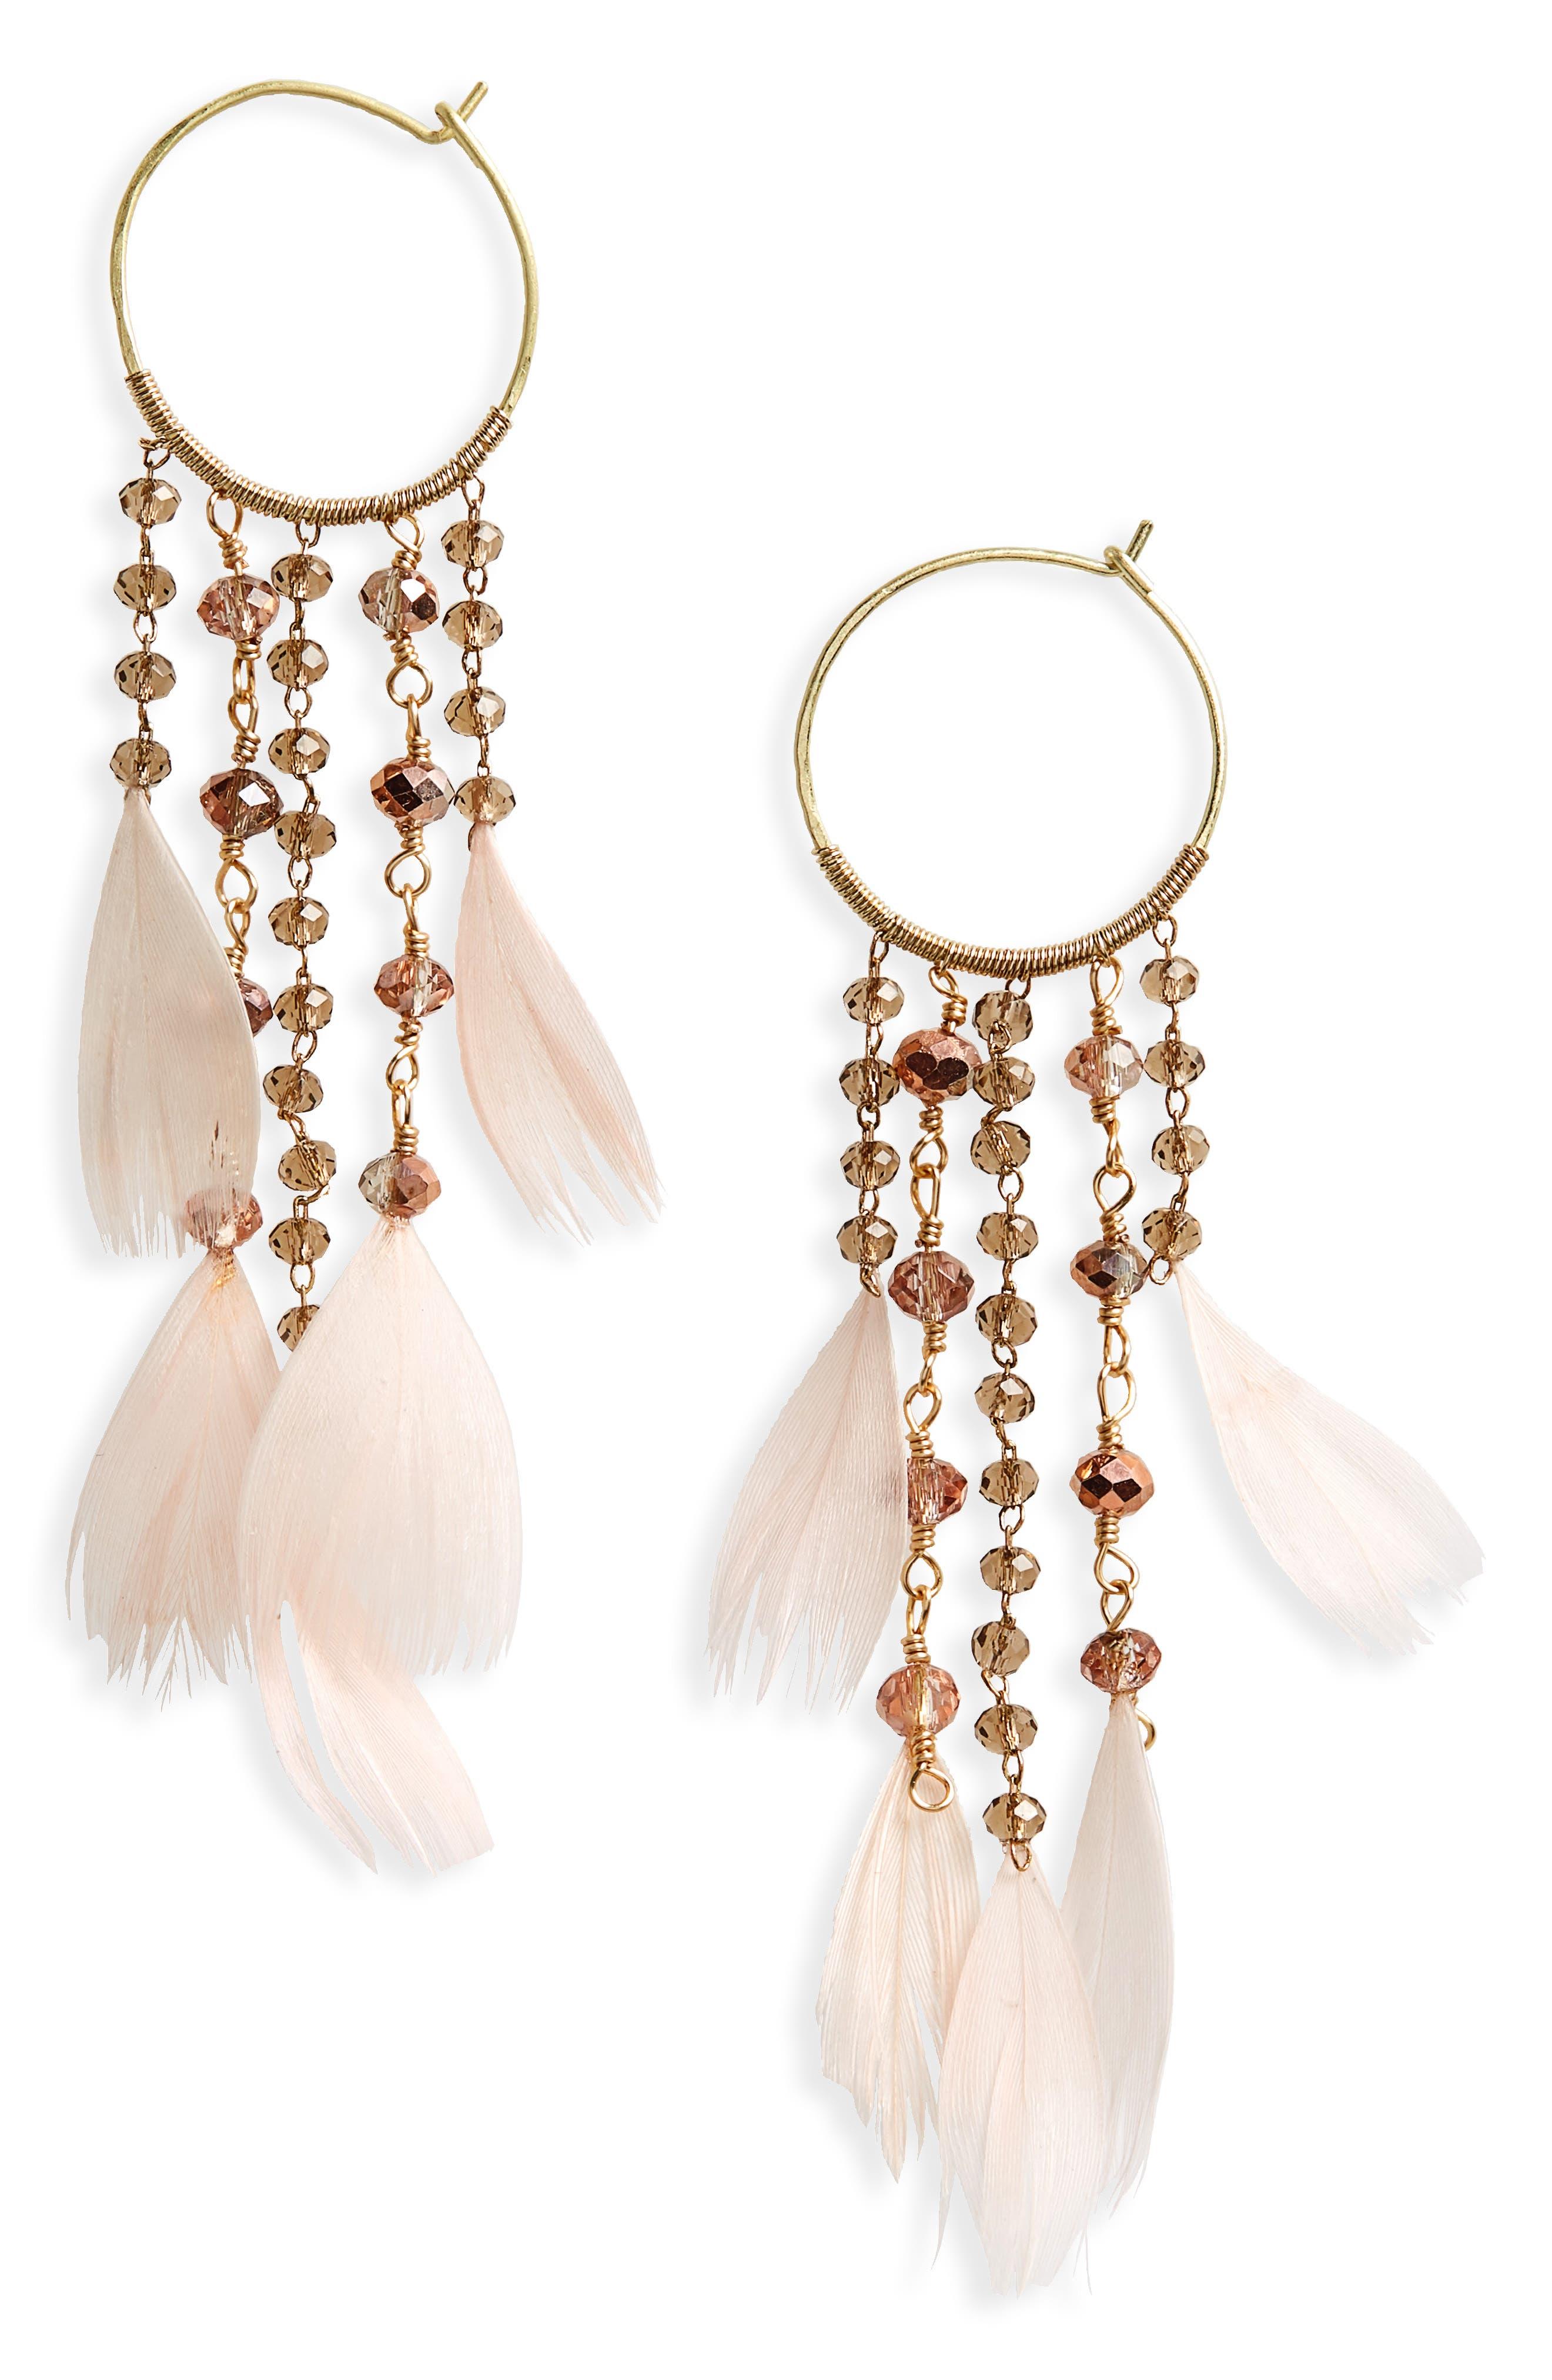 Cascading Crystal & Feather Hoop Earrings,                         Main,                         color, Blush